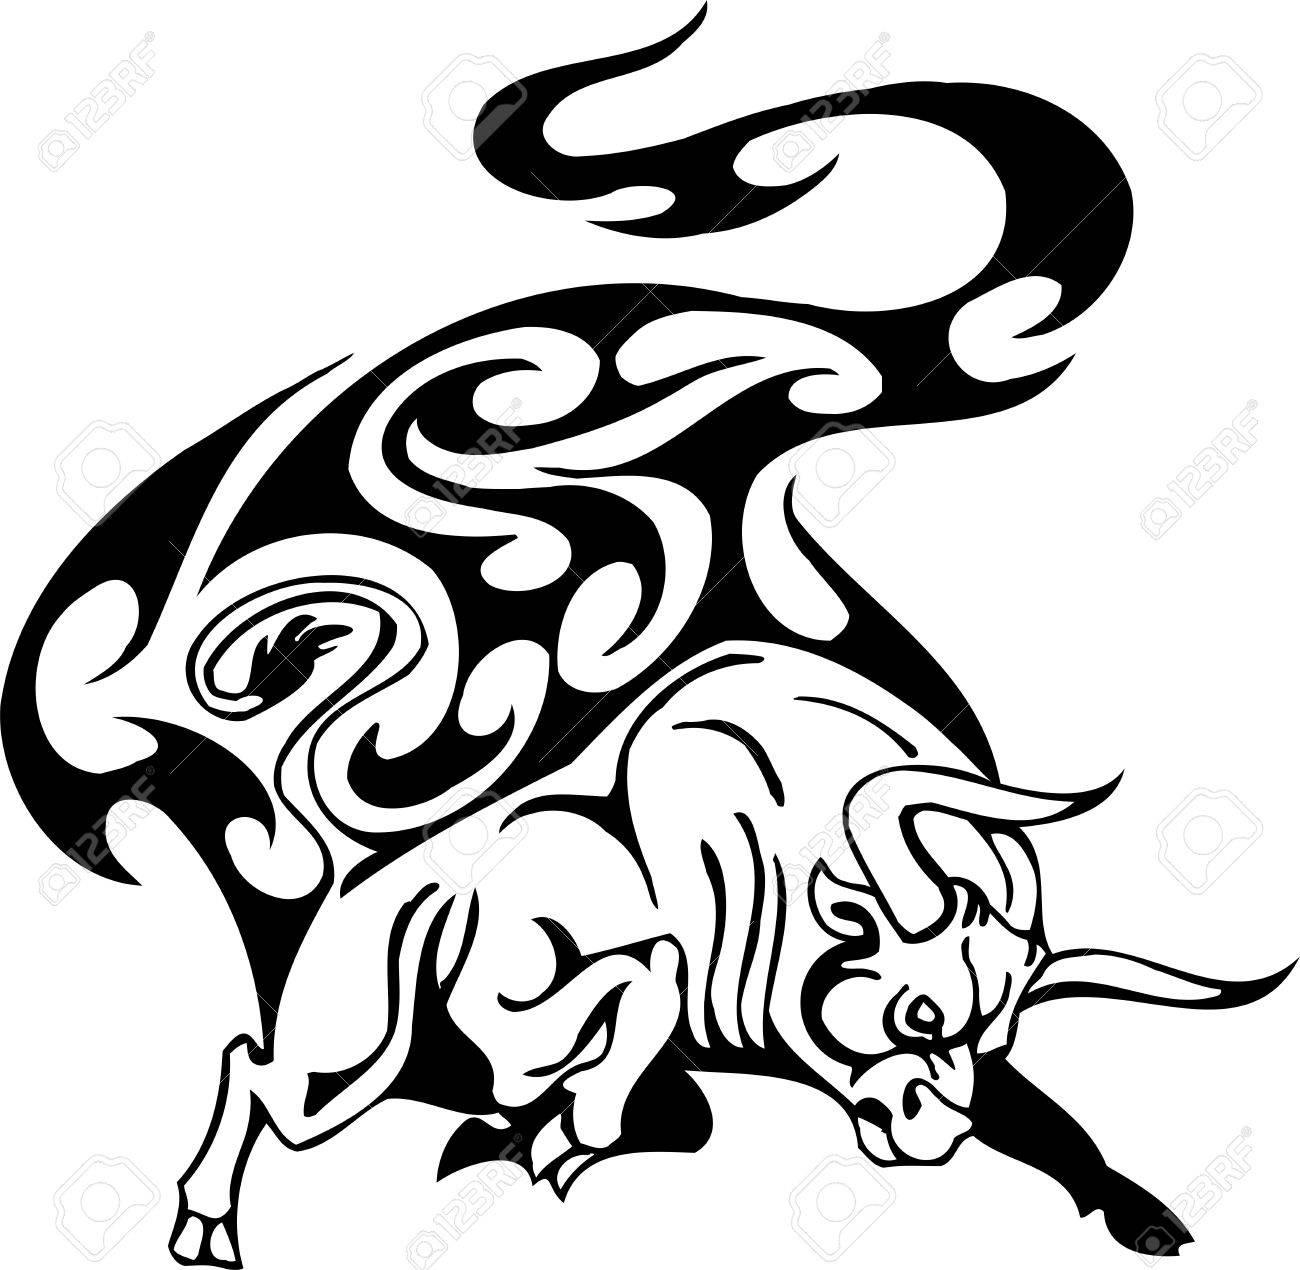 Bull in tribal style - vector image. Stock Vector - 12490322